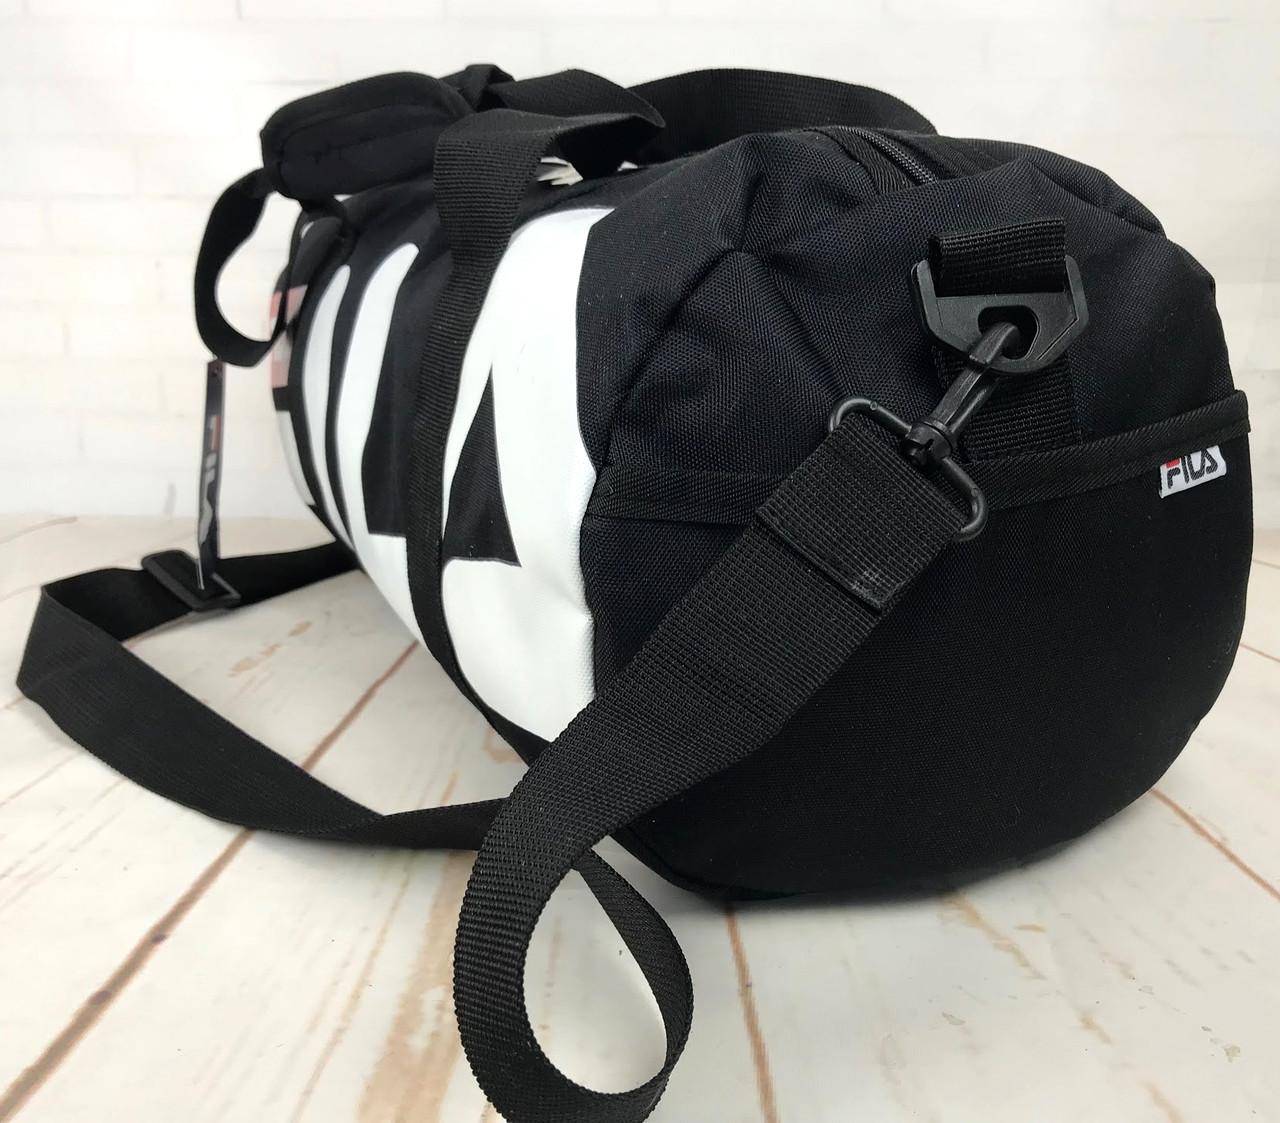 fc7a21e54a4f Небольшая красивая спортивная сумка бочонок Fila. Раз.44см на 23 КСС12,  цена 399 грн., купить в Бердянске — Prom.ua (ID#865513524)